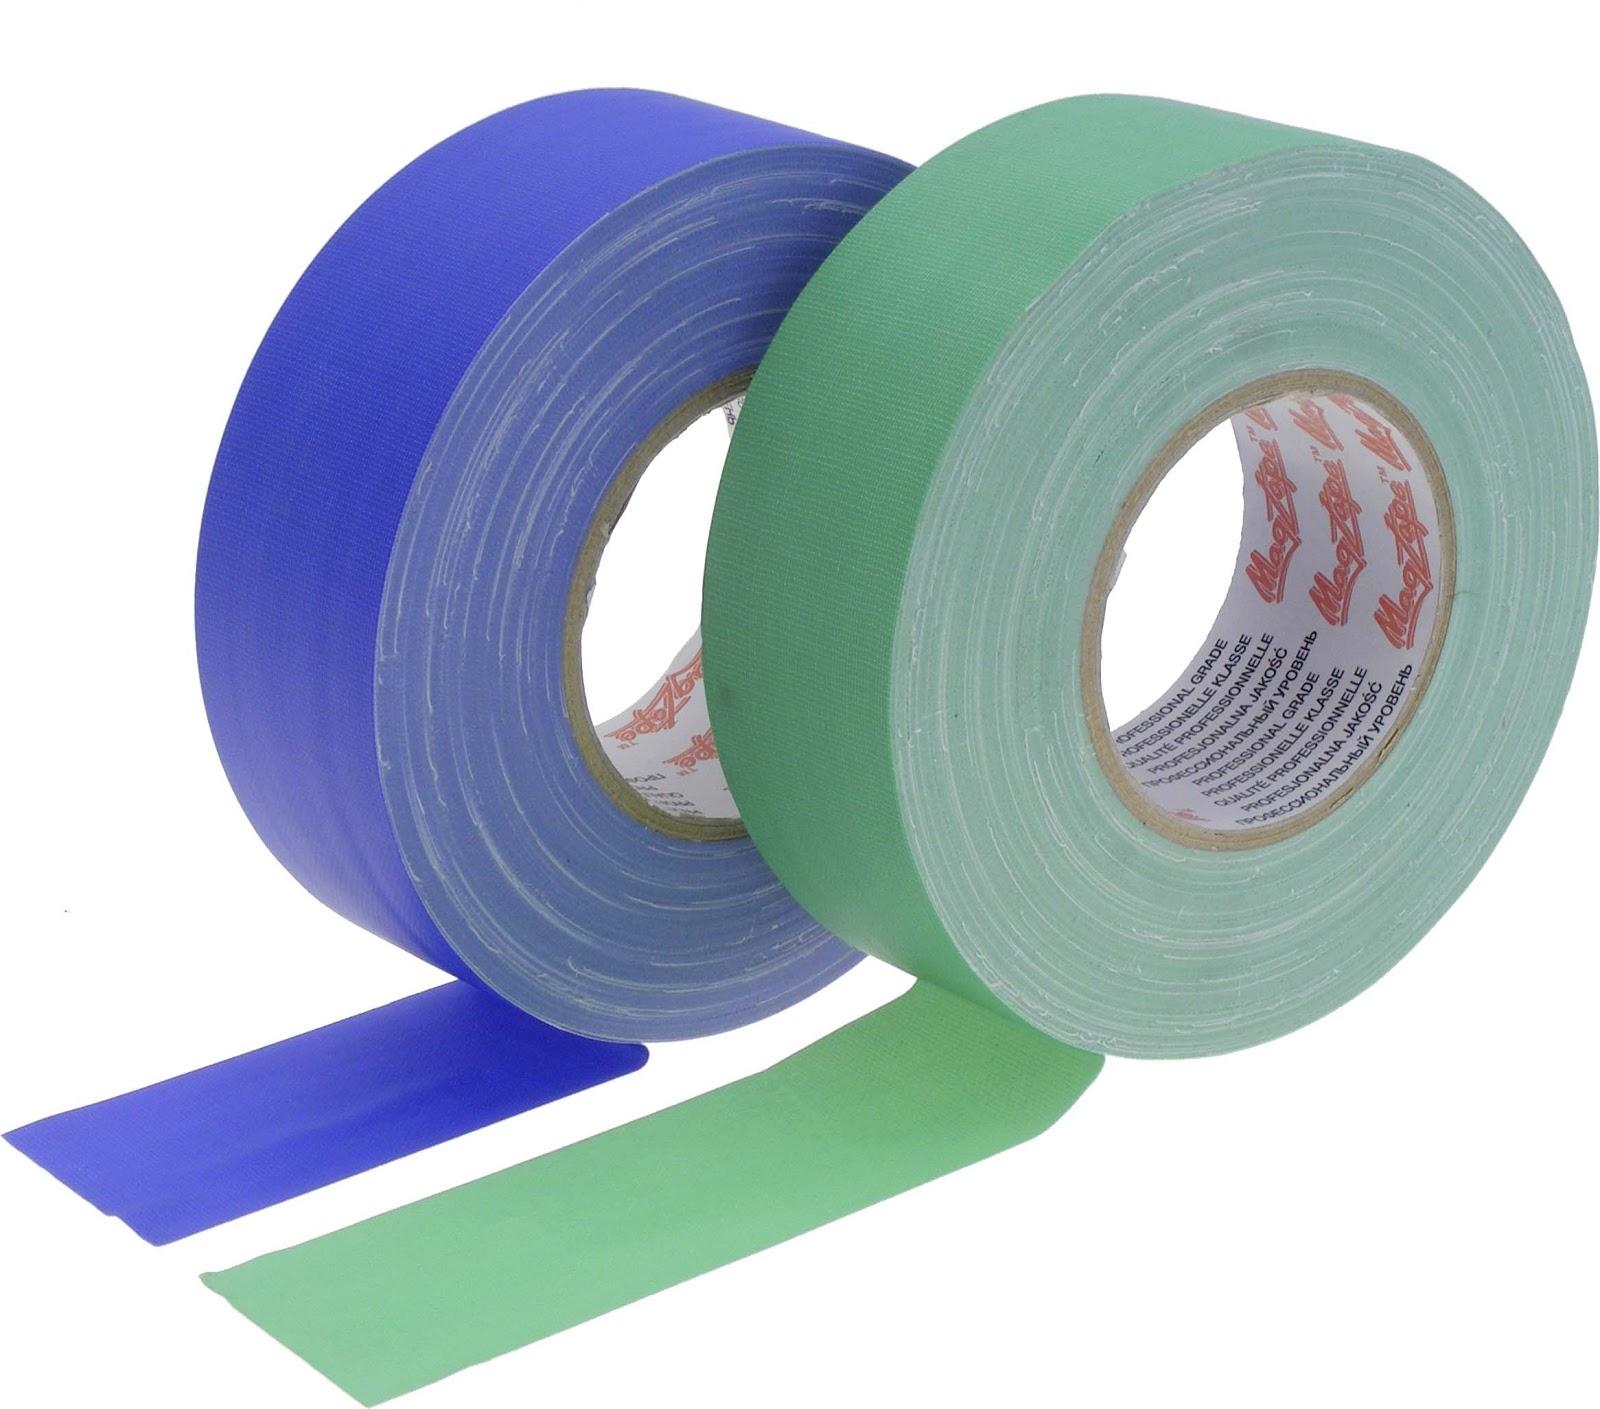 Siluj catalogo tarifa cintas adhesivas profesionales for Cinta de tela adhesiva